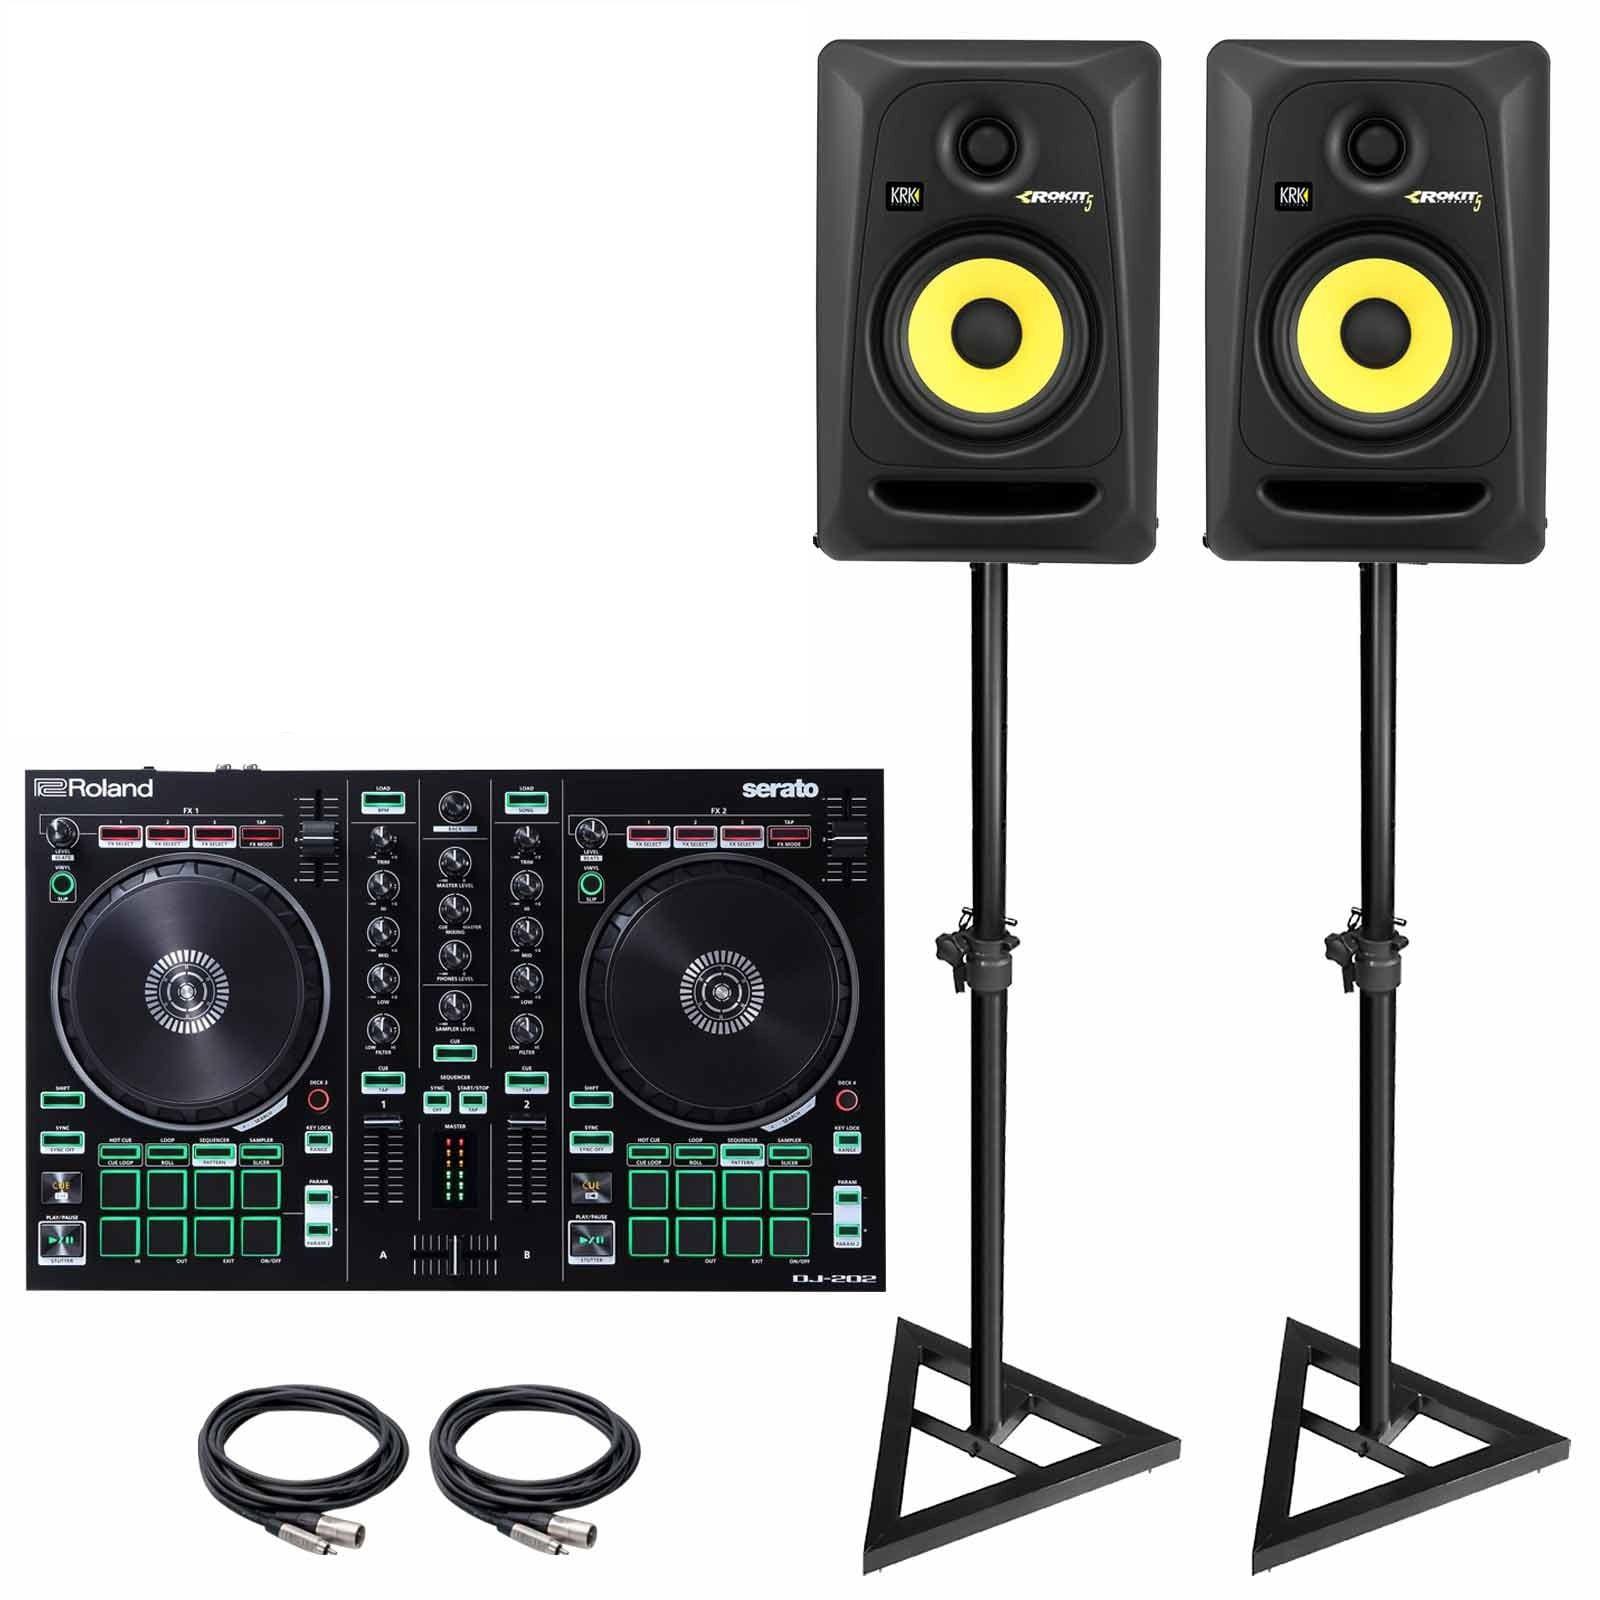 Roland DJ-202 Serato DJ Controller with KRK RP5G3 5-inch Active